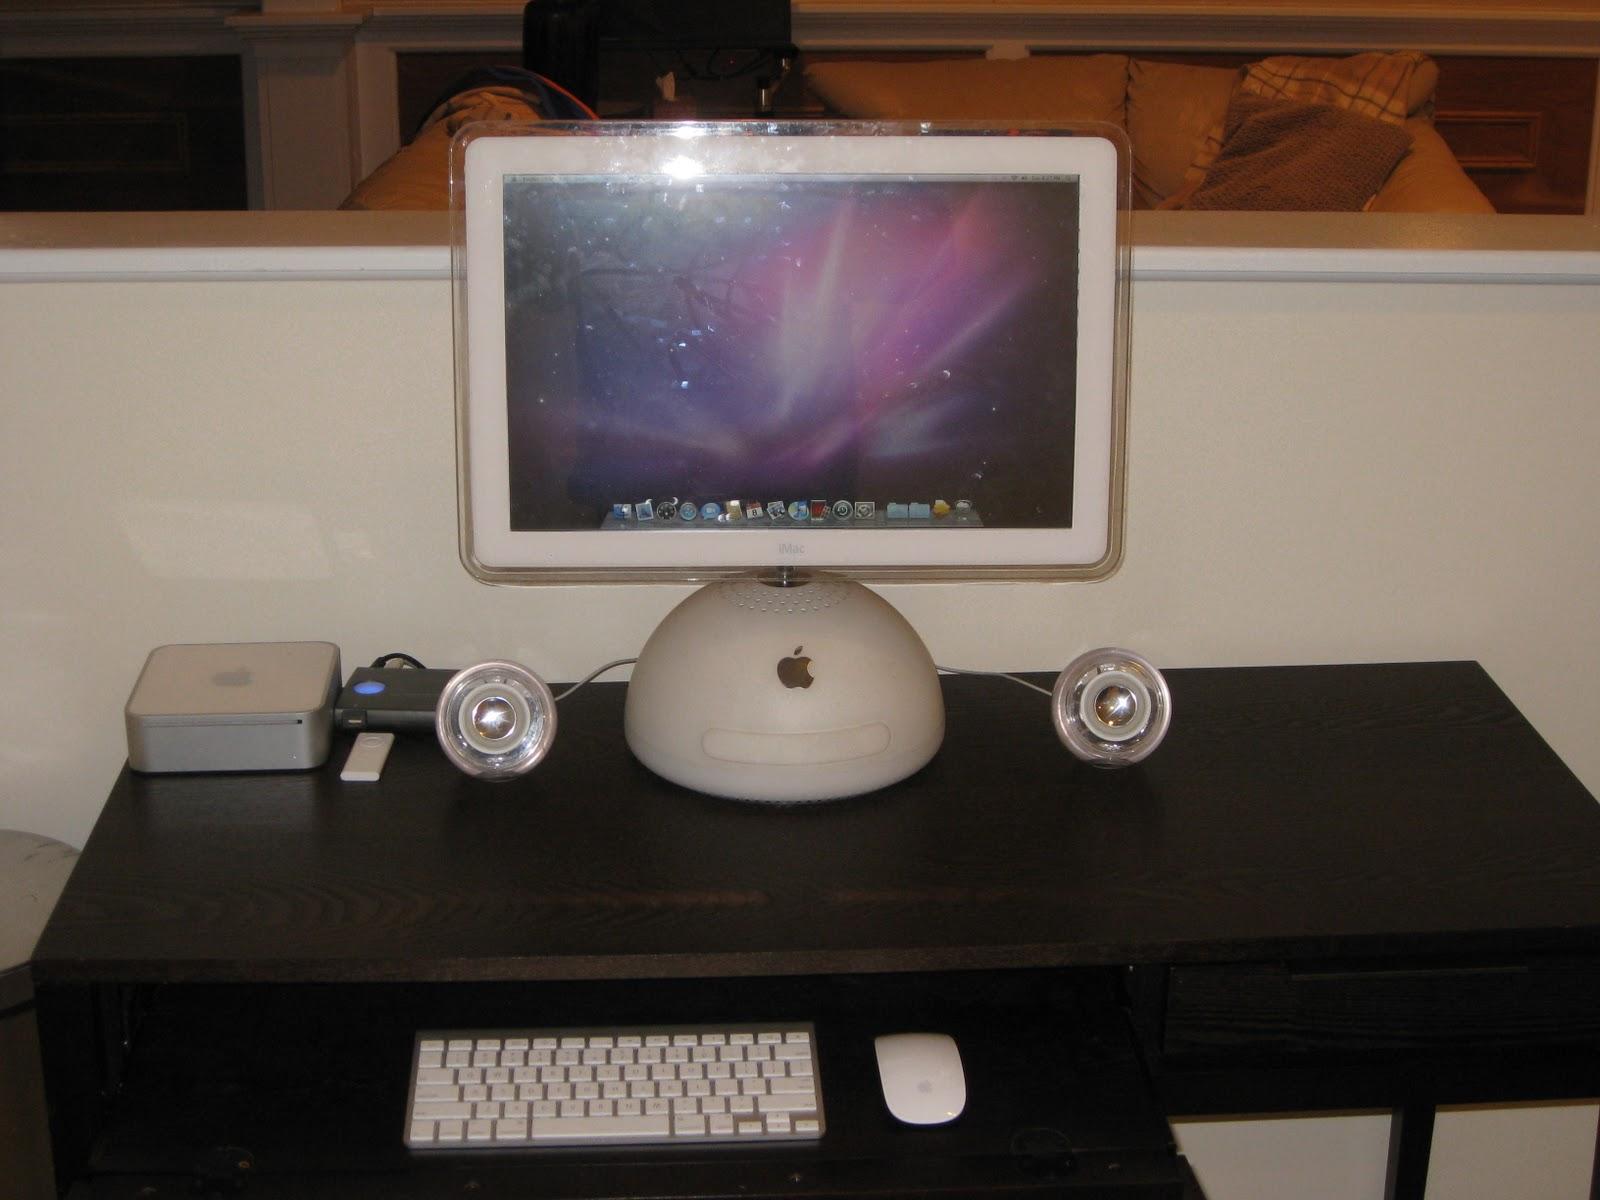 Can i hook up my mac mini to my imac